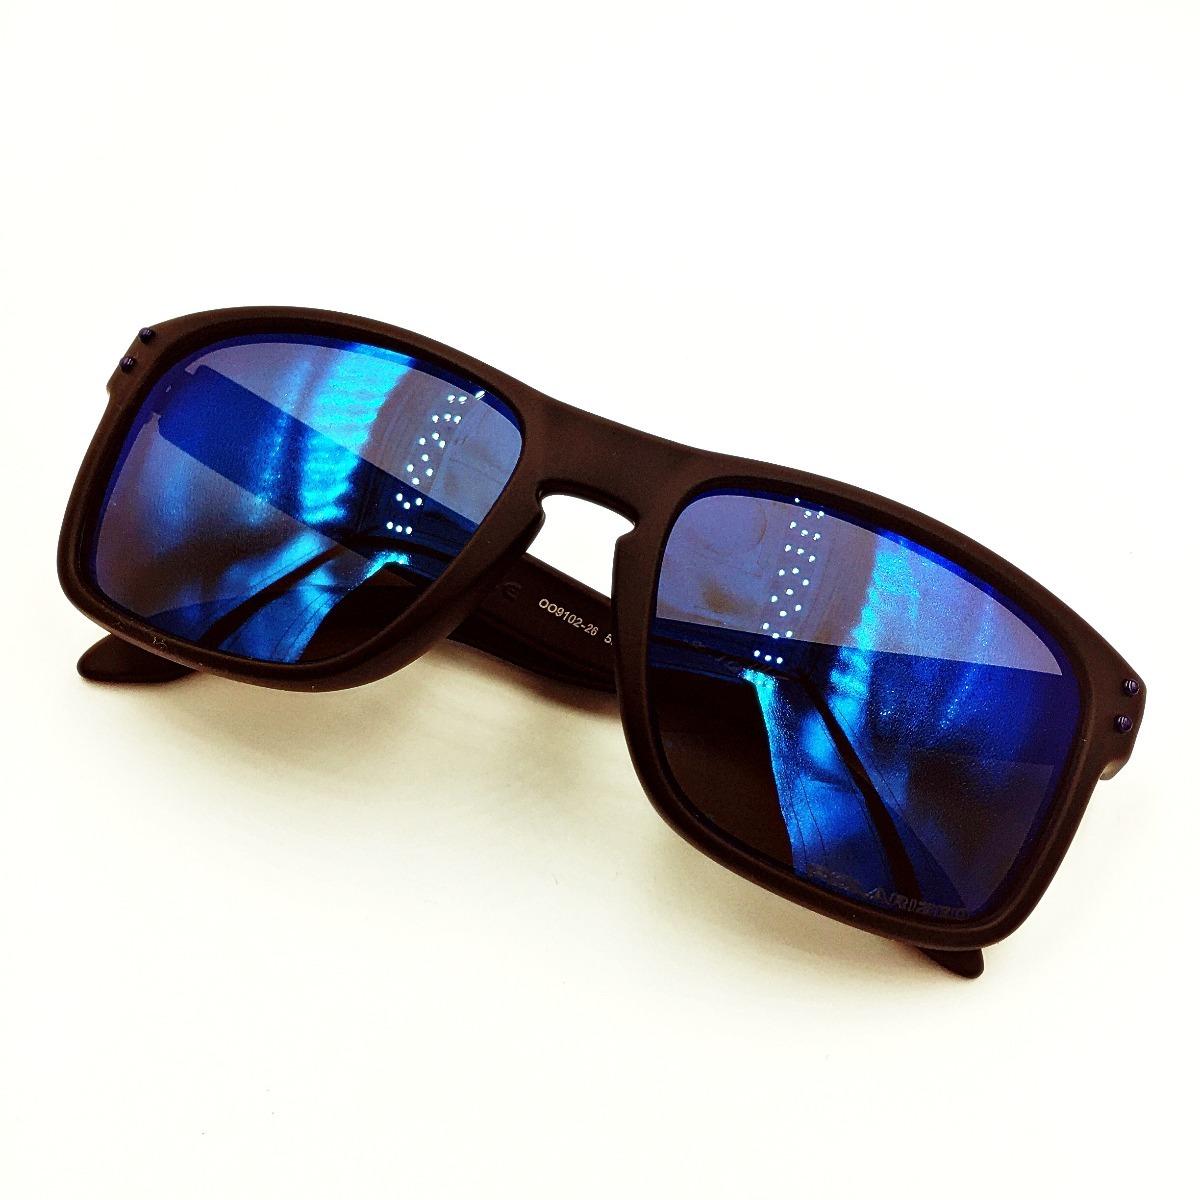 8bfc2570a3 oakley holbrook oo9102 26 azul espejo negro mate +metal case. Cargando zoom.